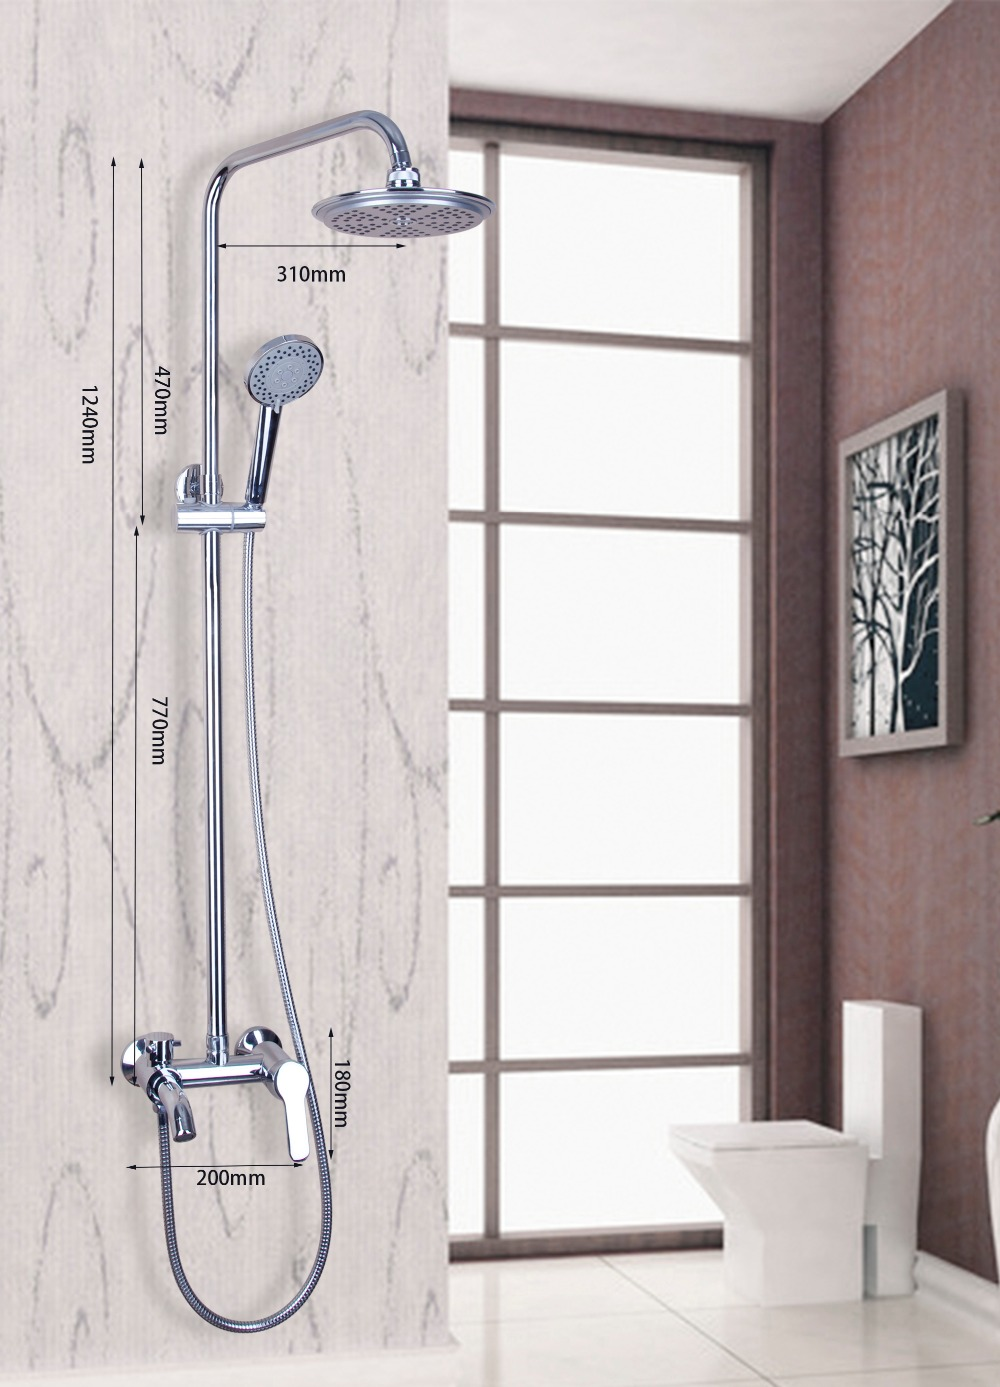 Polished Chrome Bathroom Faucet Wall Mounted Rain Shower Set Luxury ...